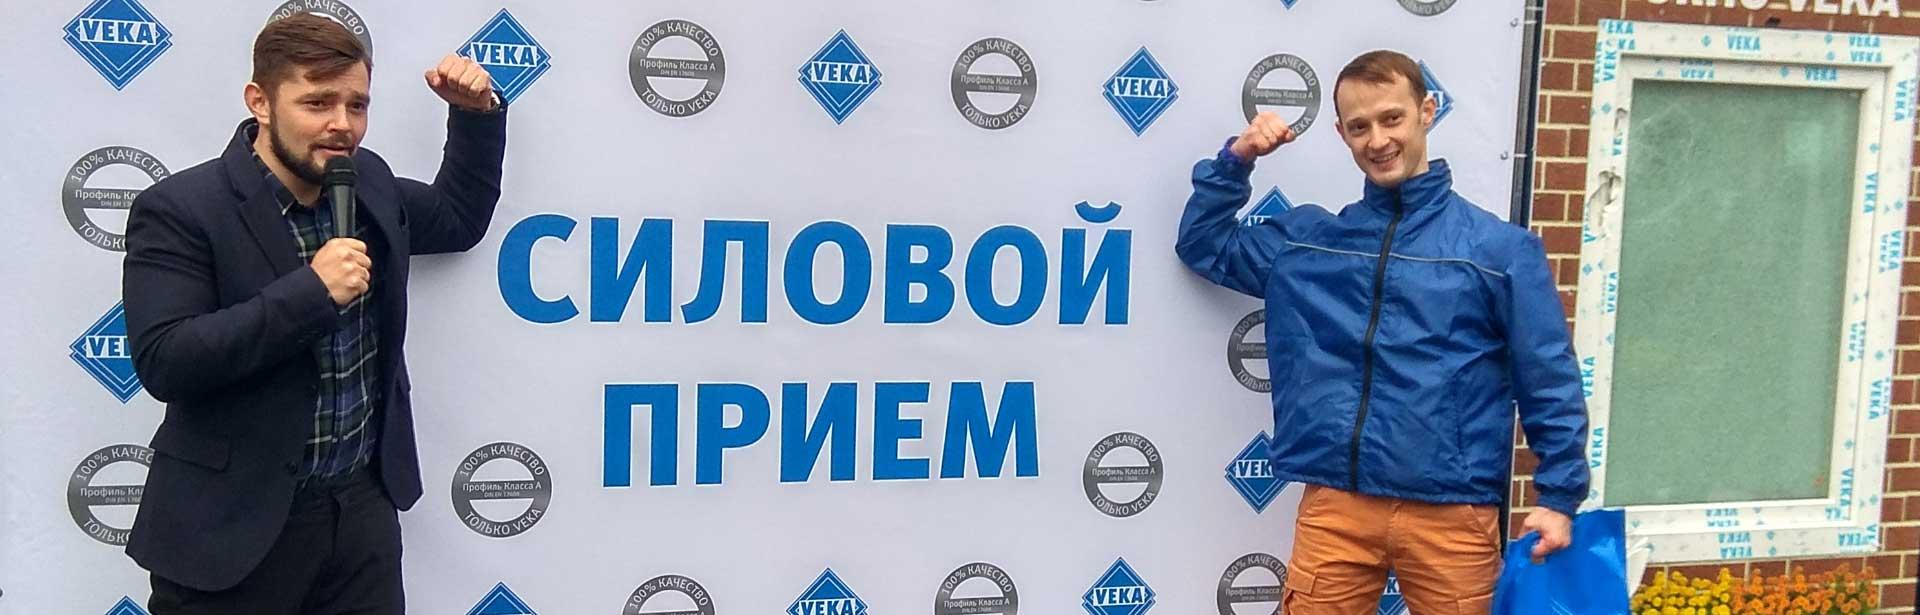 Совместная акция Окна VEKA и Окна Петербурга